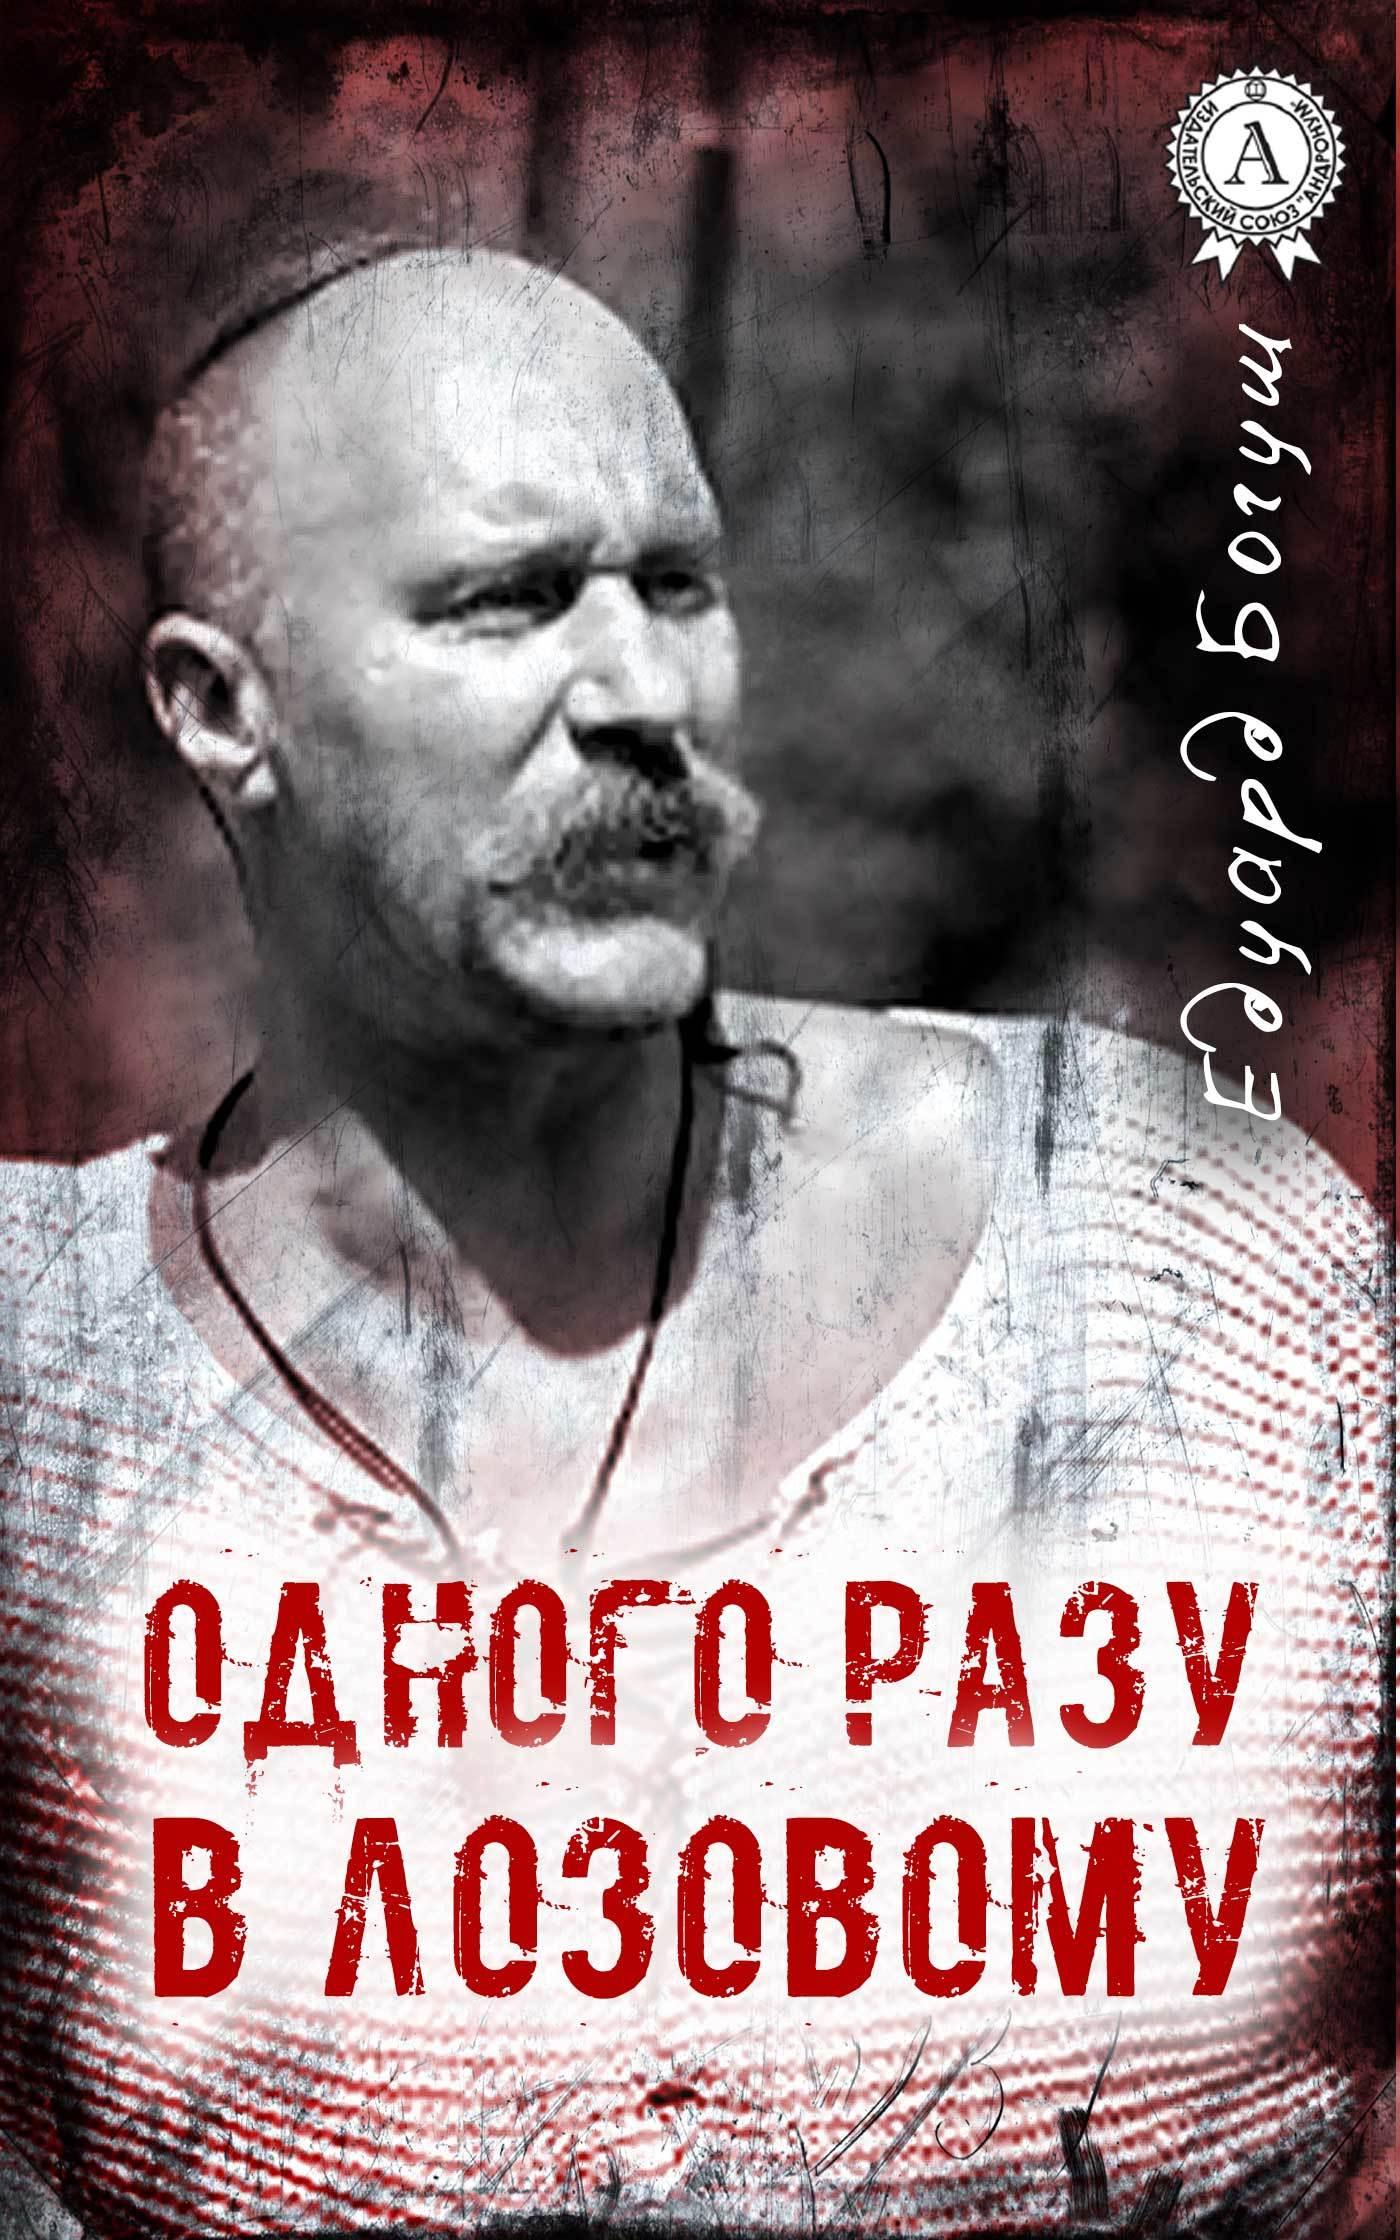 Едуард Богуш Одного разу в Лозовому василь козаченко аттестат зрелости